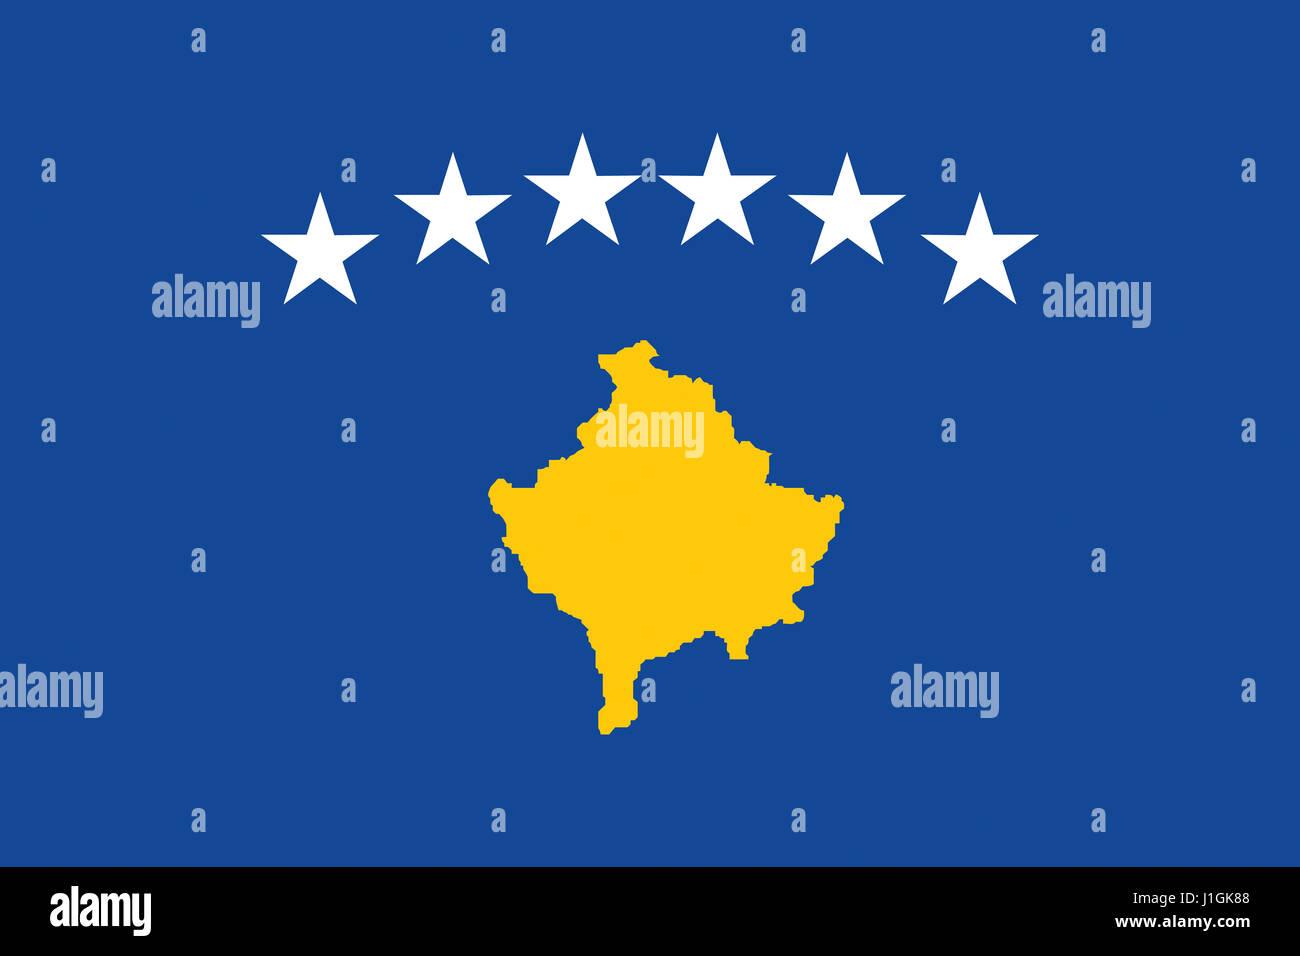 Illustration of the national flag of Kosovo Stock Photo